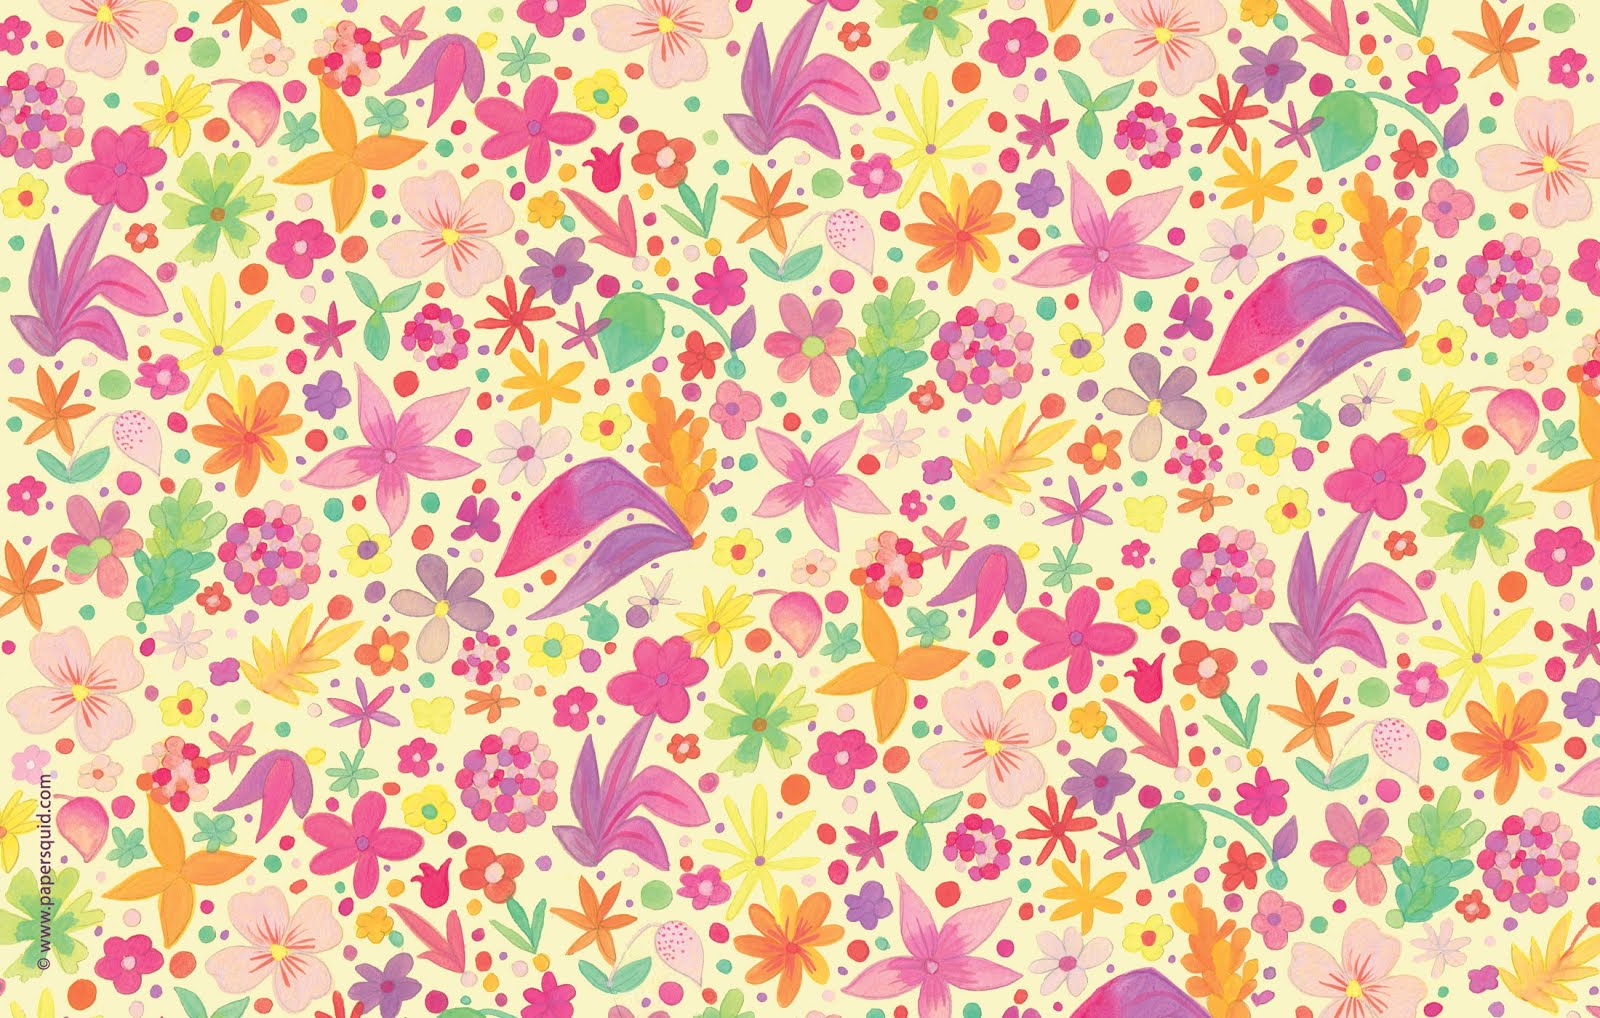 Iphone 6 Wallpaper Tumblr Vintage